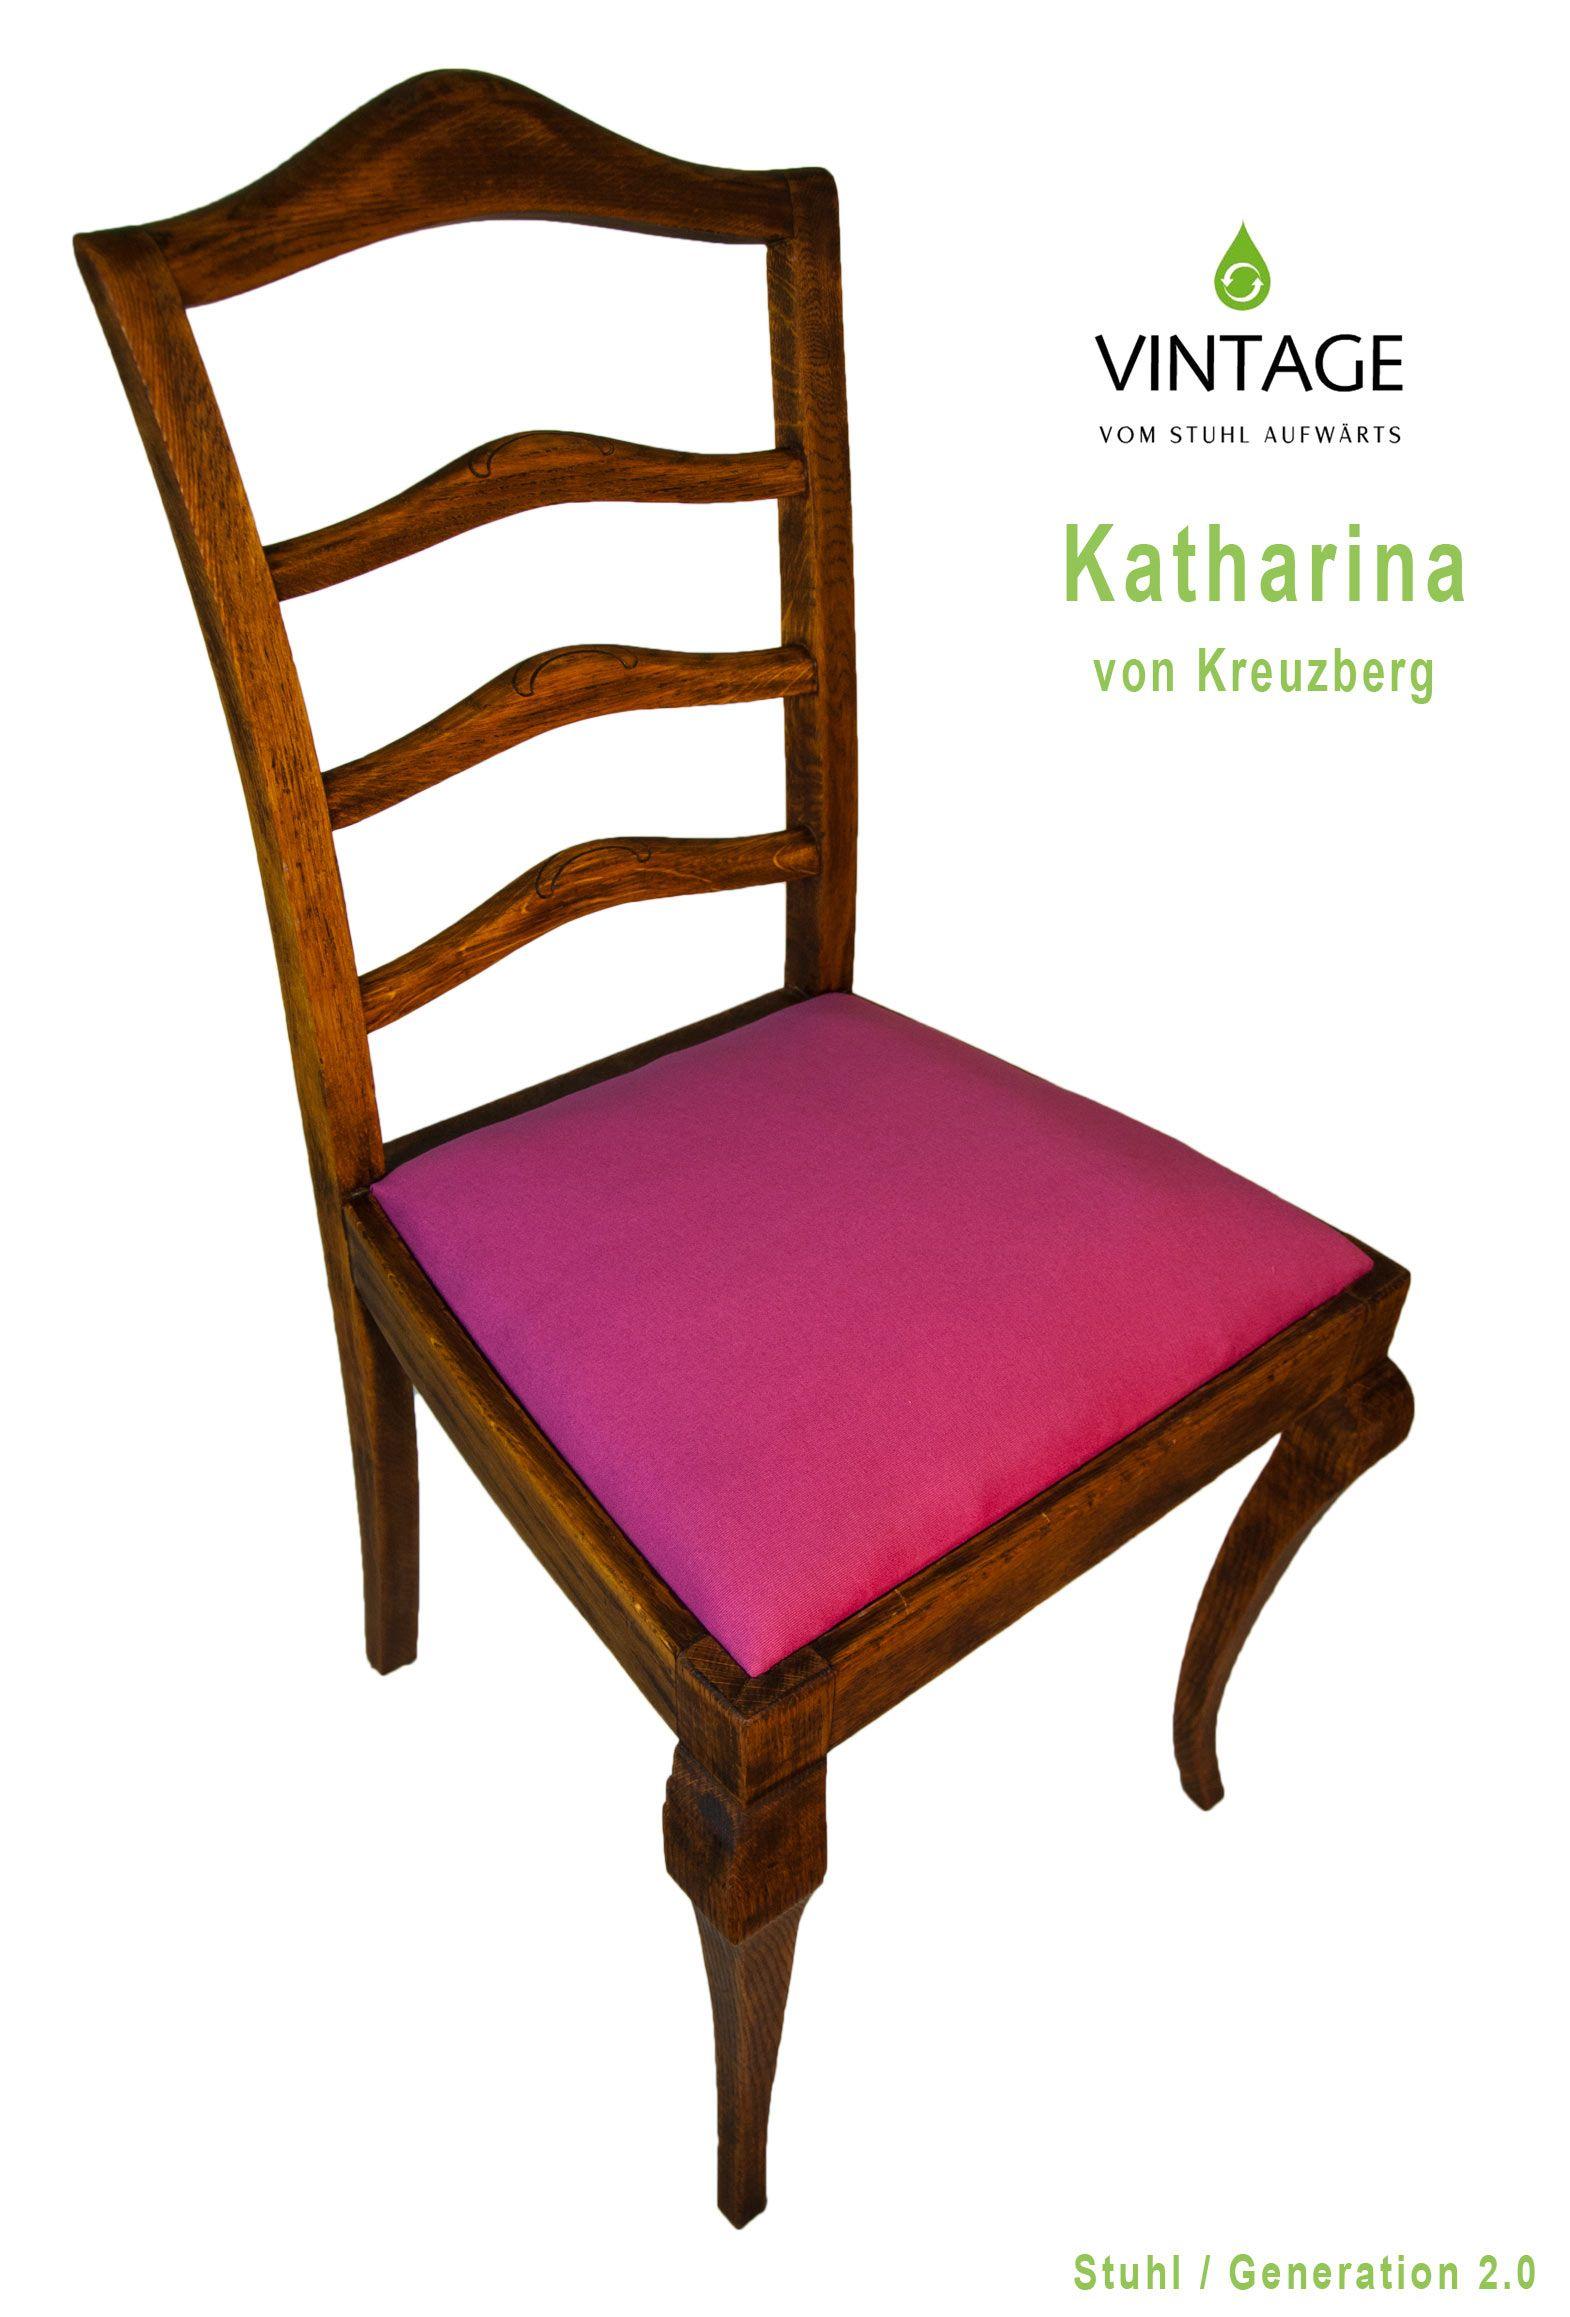 Bezaubernd Holzstuhl Mit Polster Beste Wahl Katharina Von Kreuzberg #vintage #stuhldesign #vintagemöbel #alterstuhl